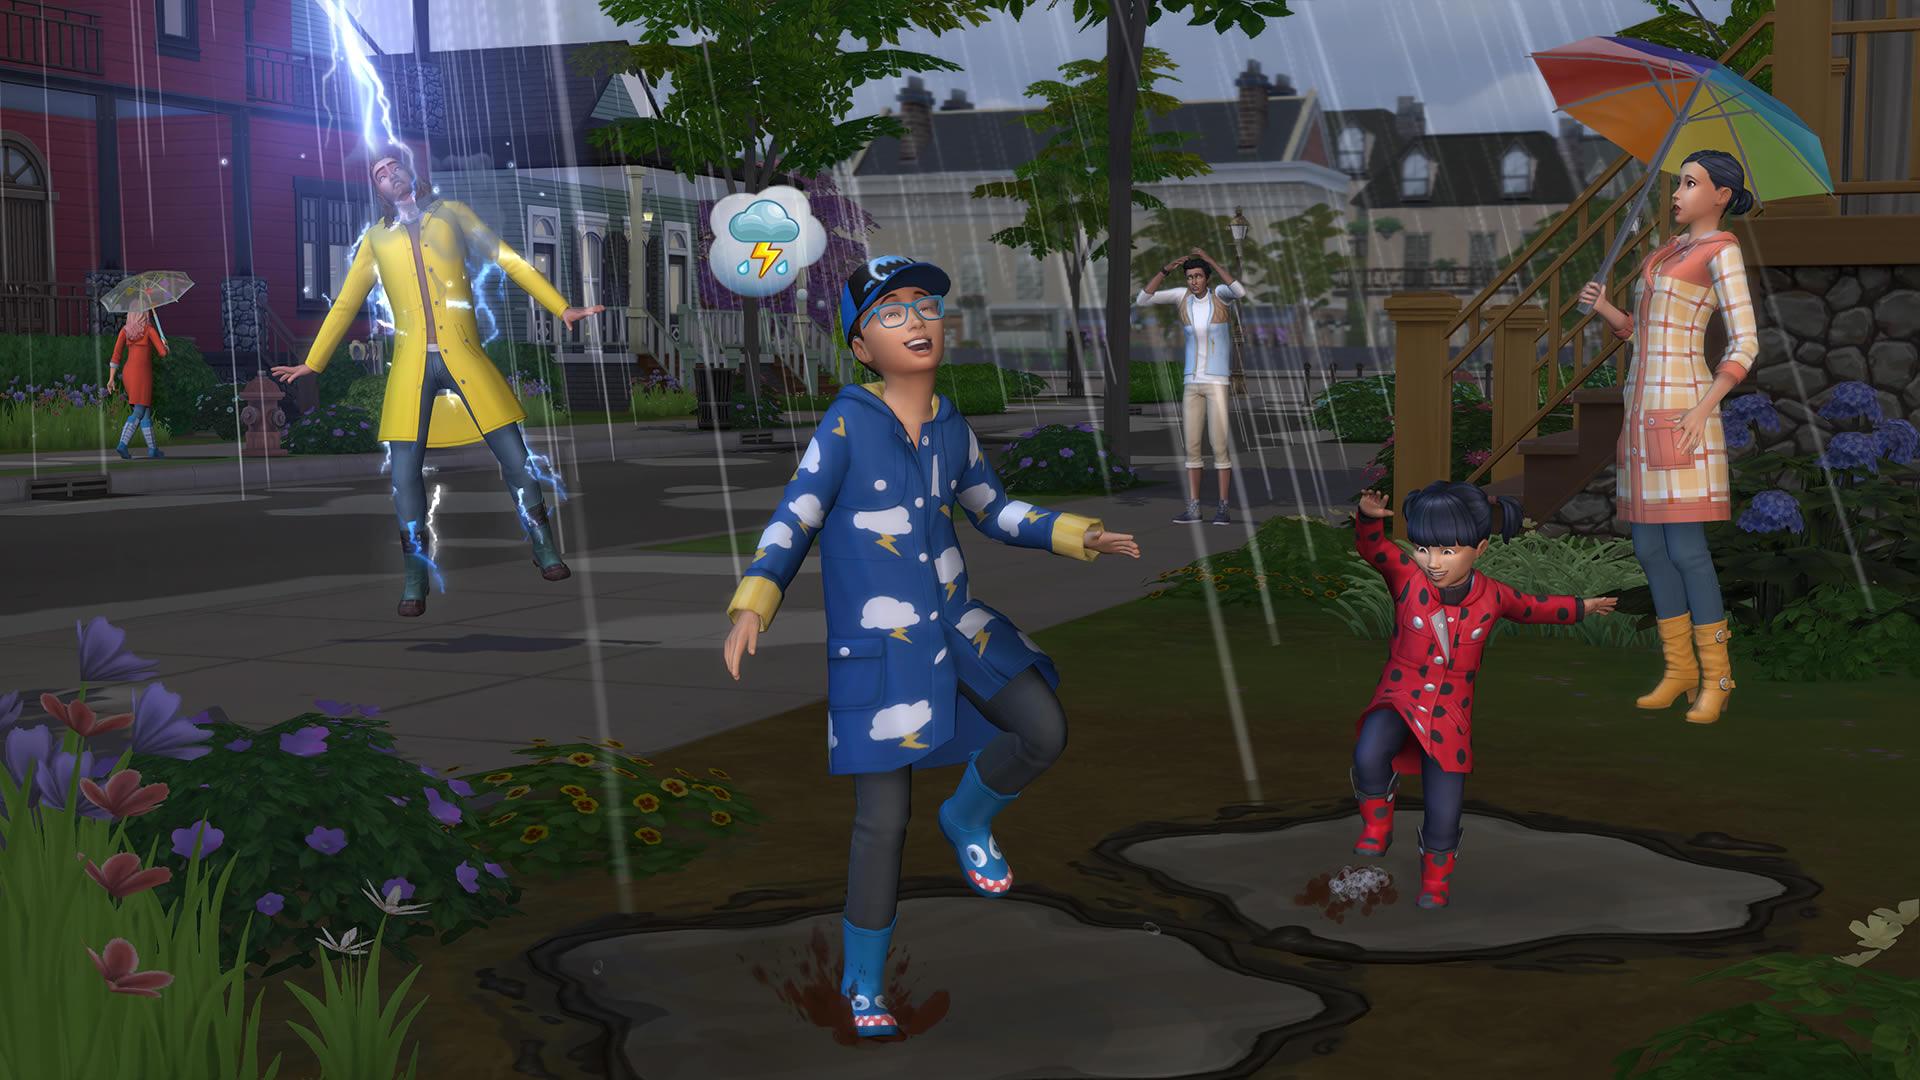 Скриншот №5 к The Sims 4 Времена года